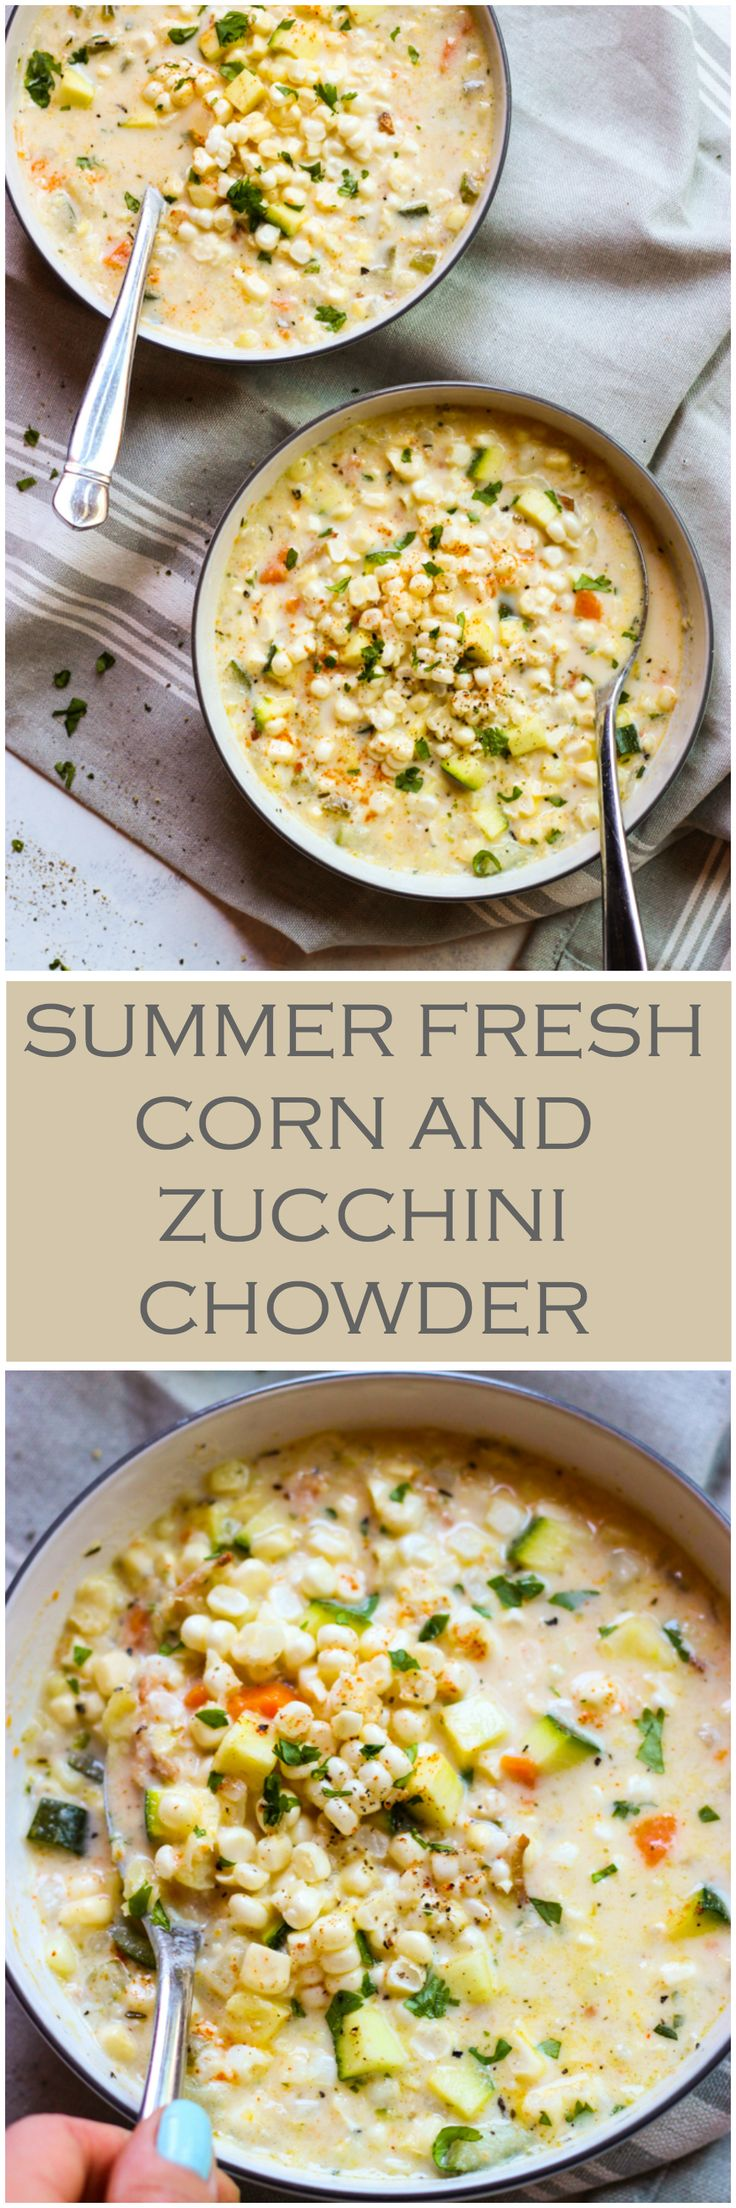 Summer Fresh Corn and Zucchini Chowder - the BEST healthy chowder! At only 173 calories, NO flour, NO heavy cream | littlebroken.com @littlebroken